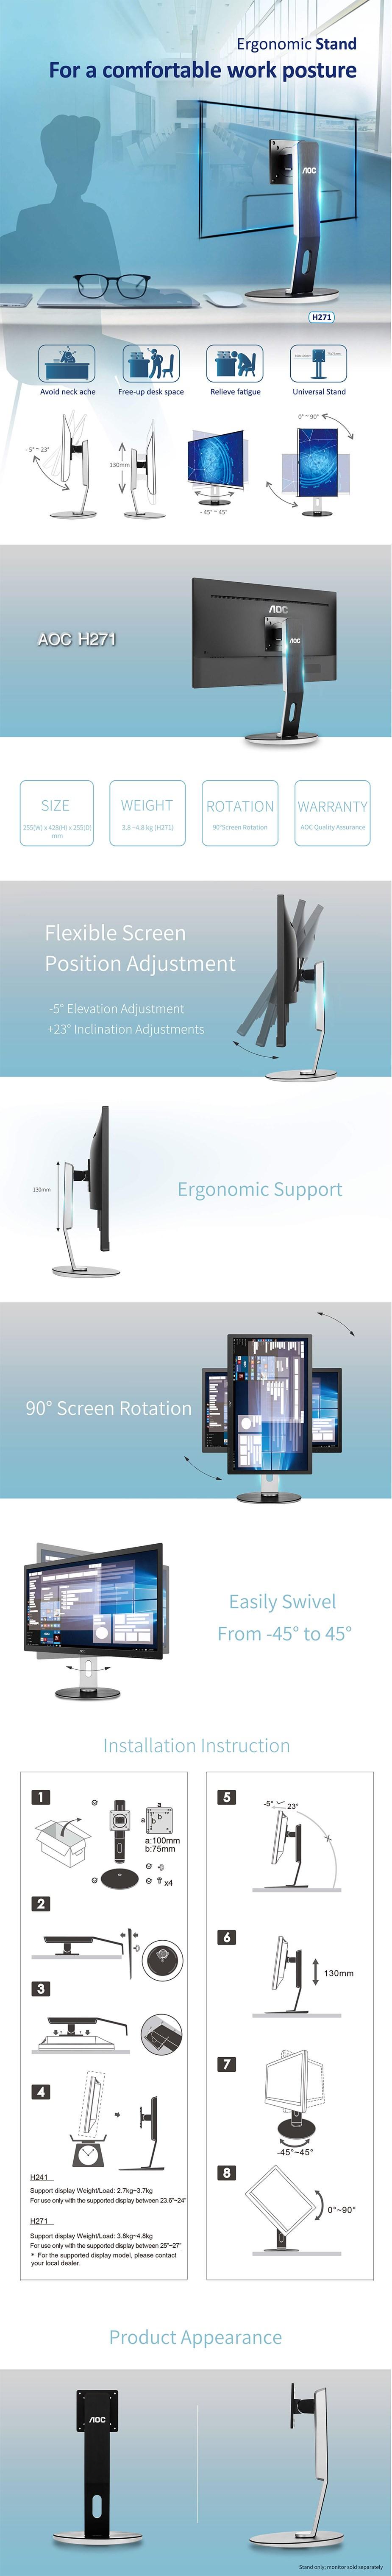 aoc_h271_ergonomic_adjustable_vesa_monitor_stand_ac33536_3.jpg